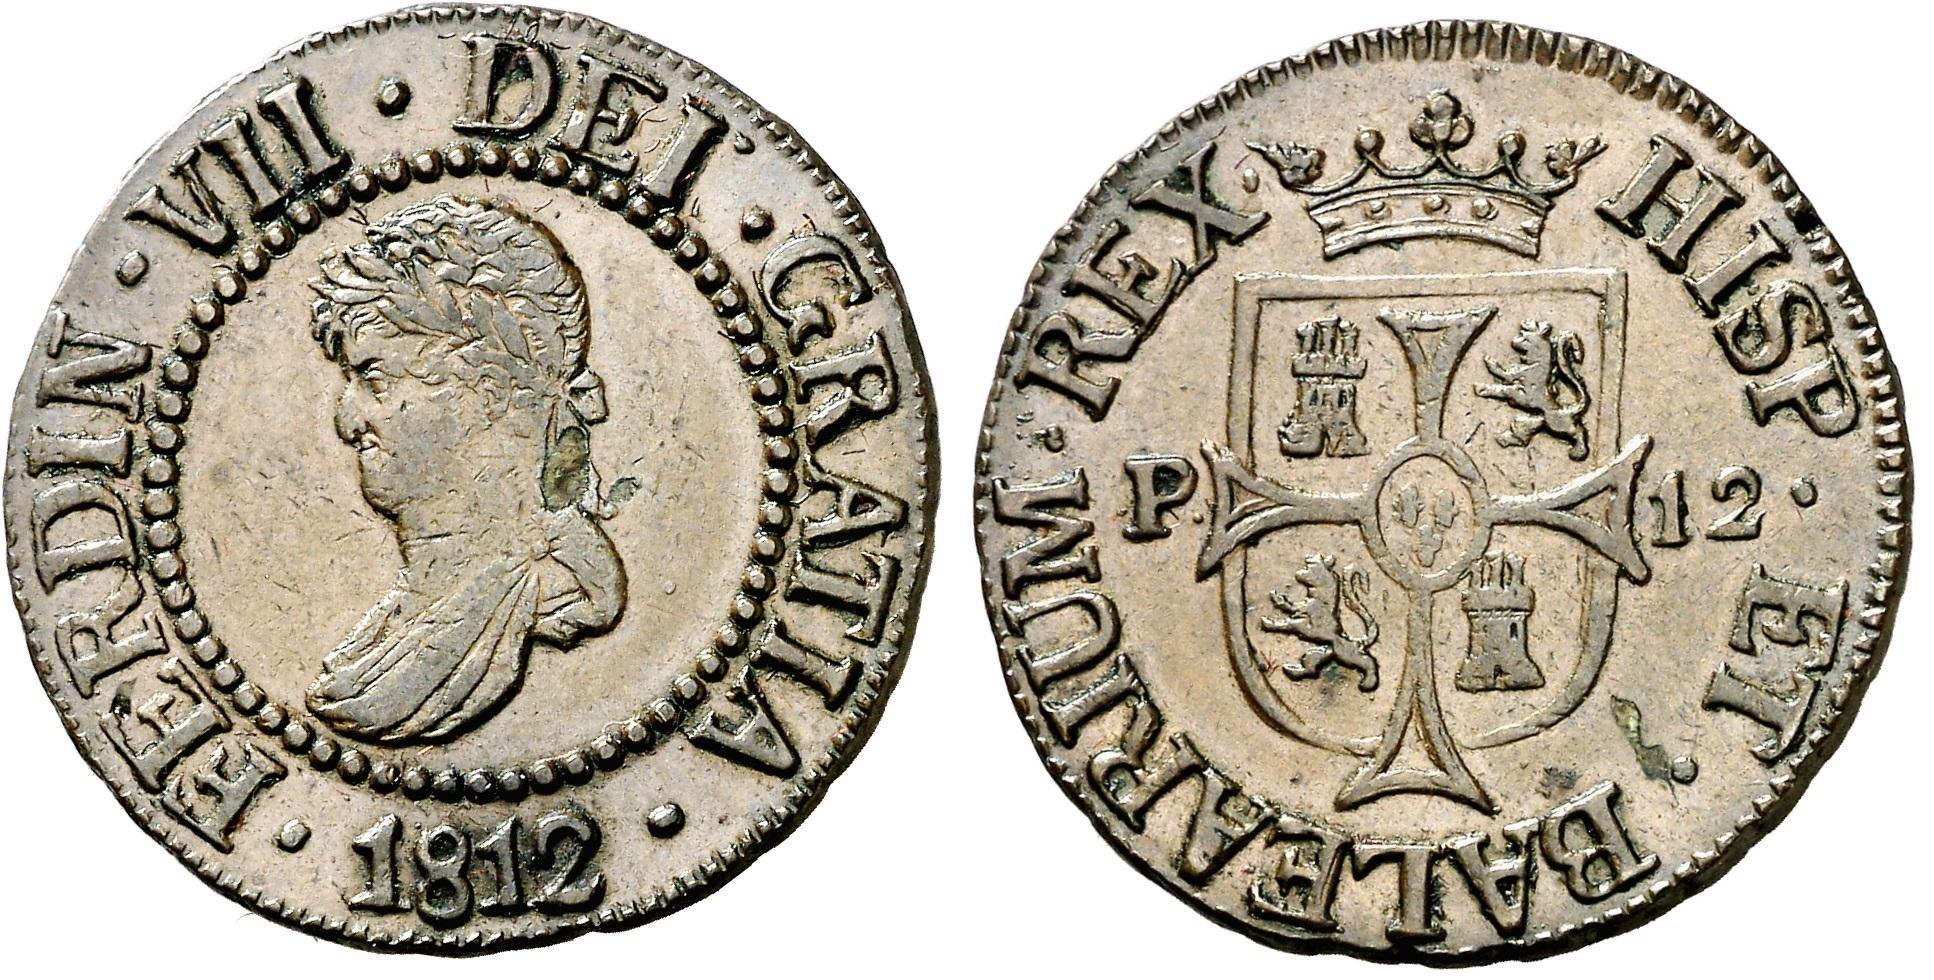 12 Dineros 1812. Fernando VII. Mallorca.  EBC/AU Ex Ramón Llull 2i7bz4p